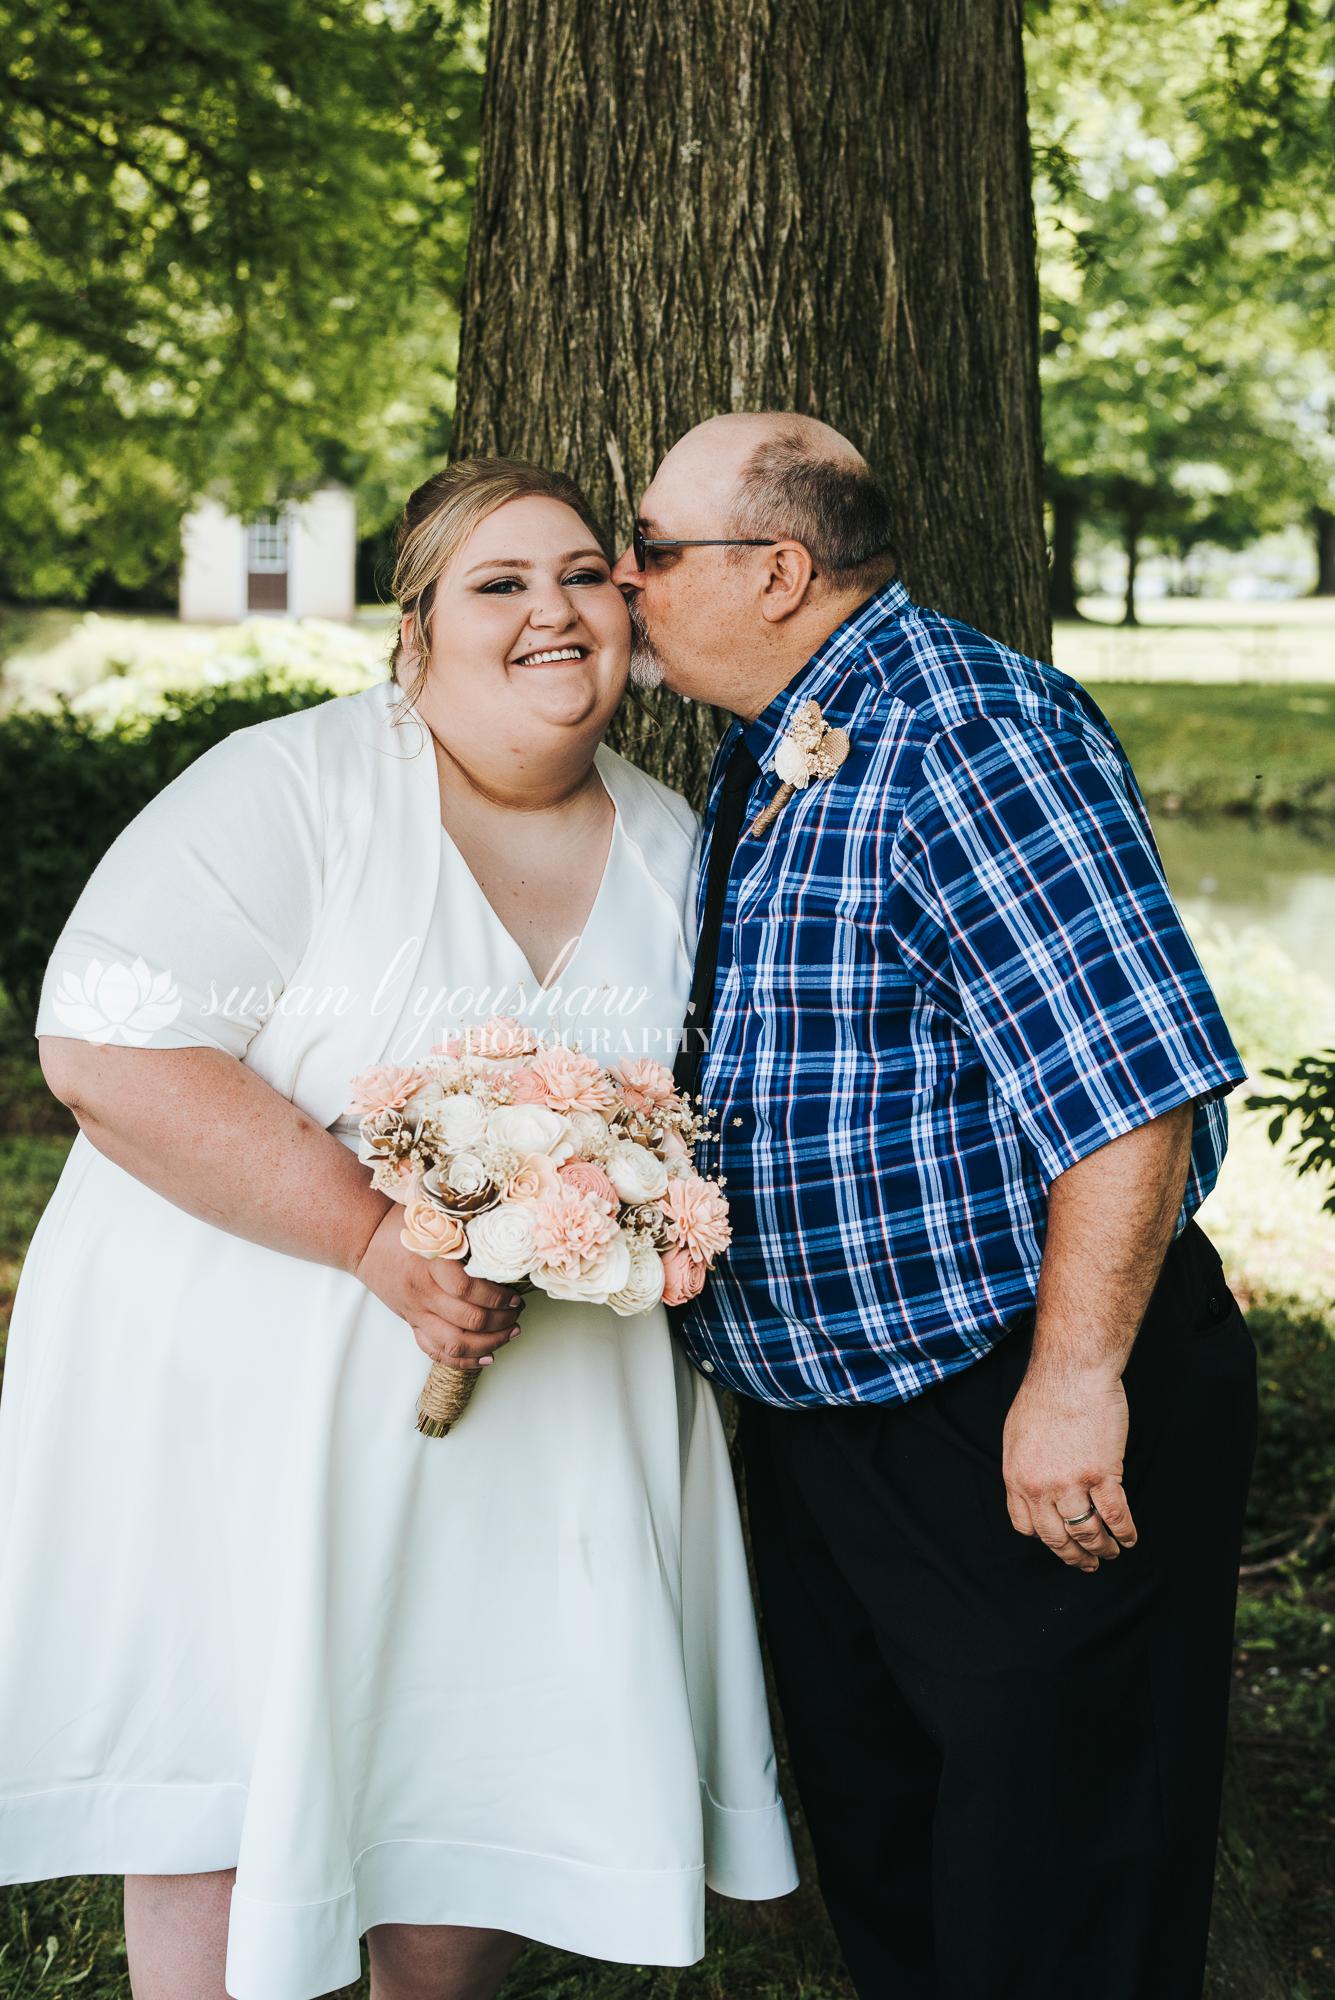 Bill and Sarah Wedding Photos 06-08-2019 SLY Photography -53.jpg